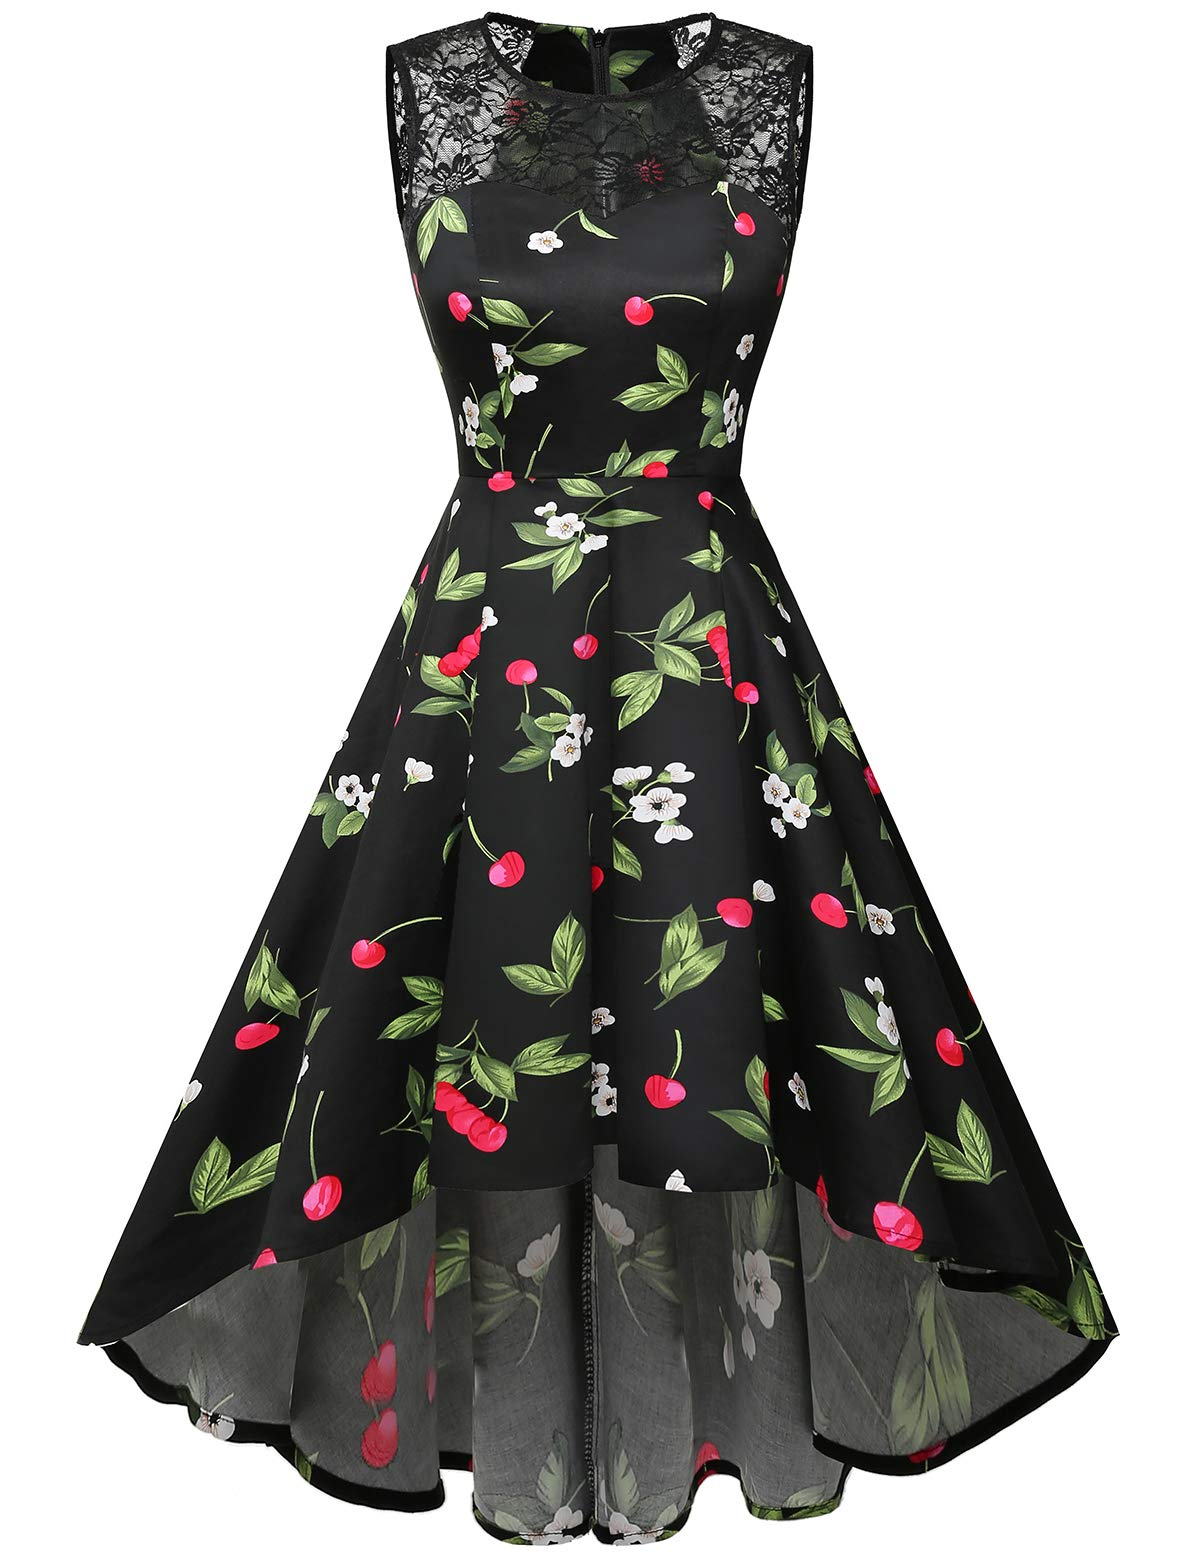 Homrain Women's Vintage Elegant Lace Sleeveless Hi-Lo Cocktail Prom Party Swing Dress